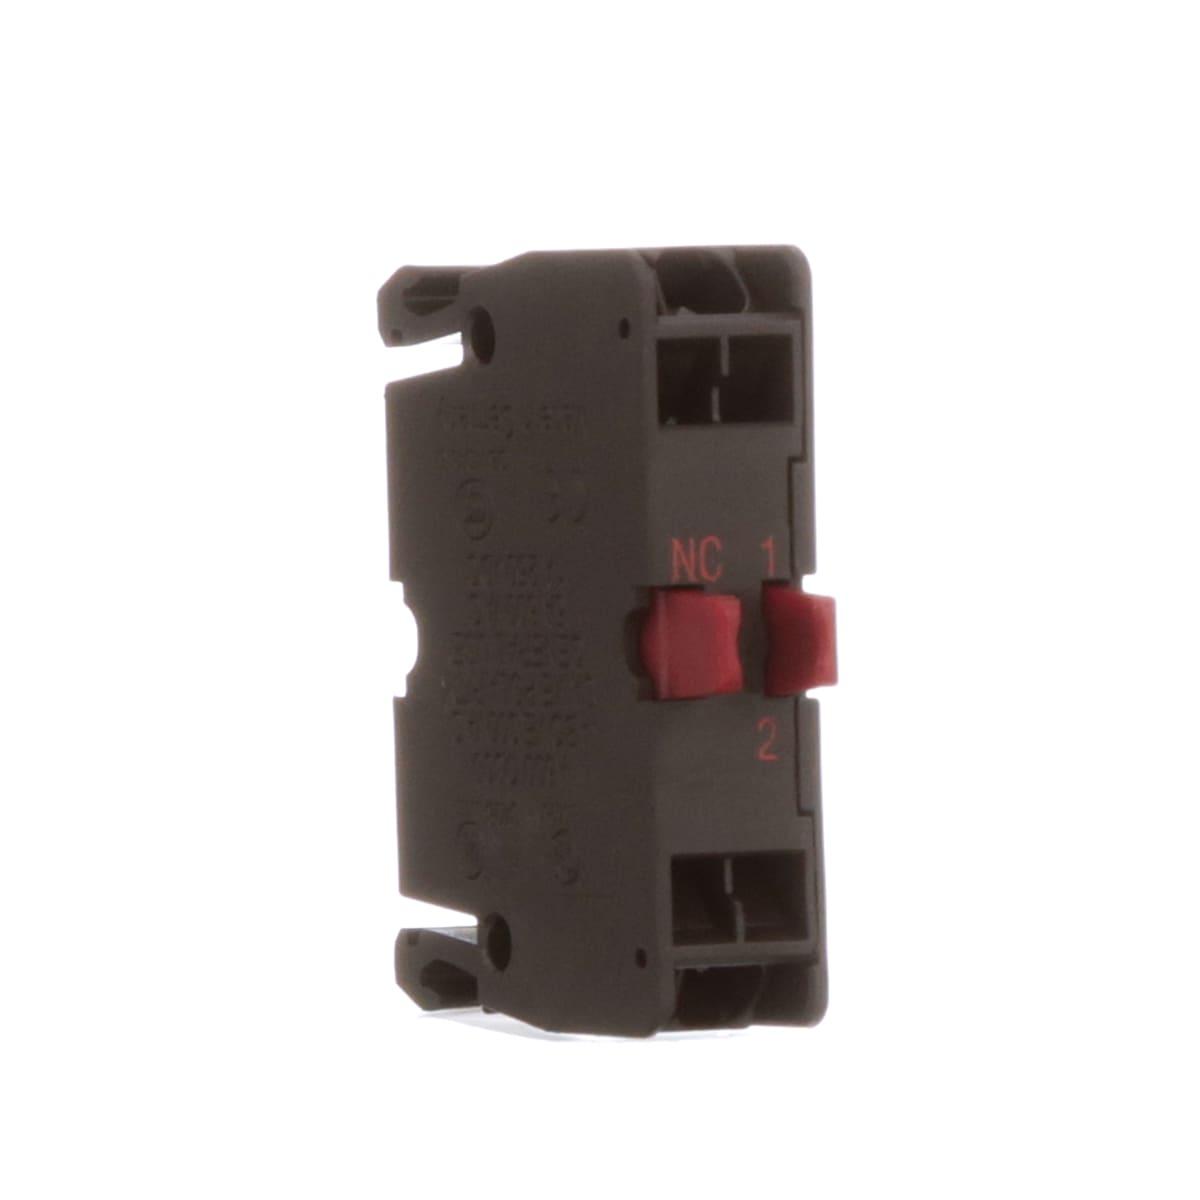 Eaton Cutler Hammer M22 Ckc01 Nc Contact Block Fuse Box Close